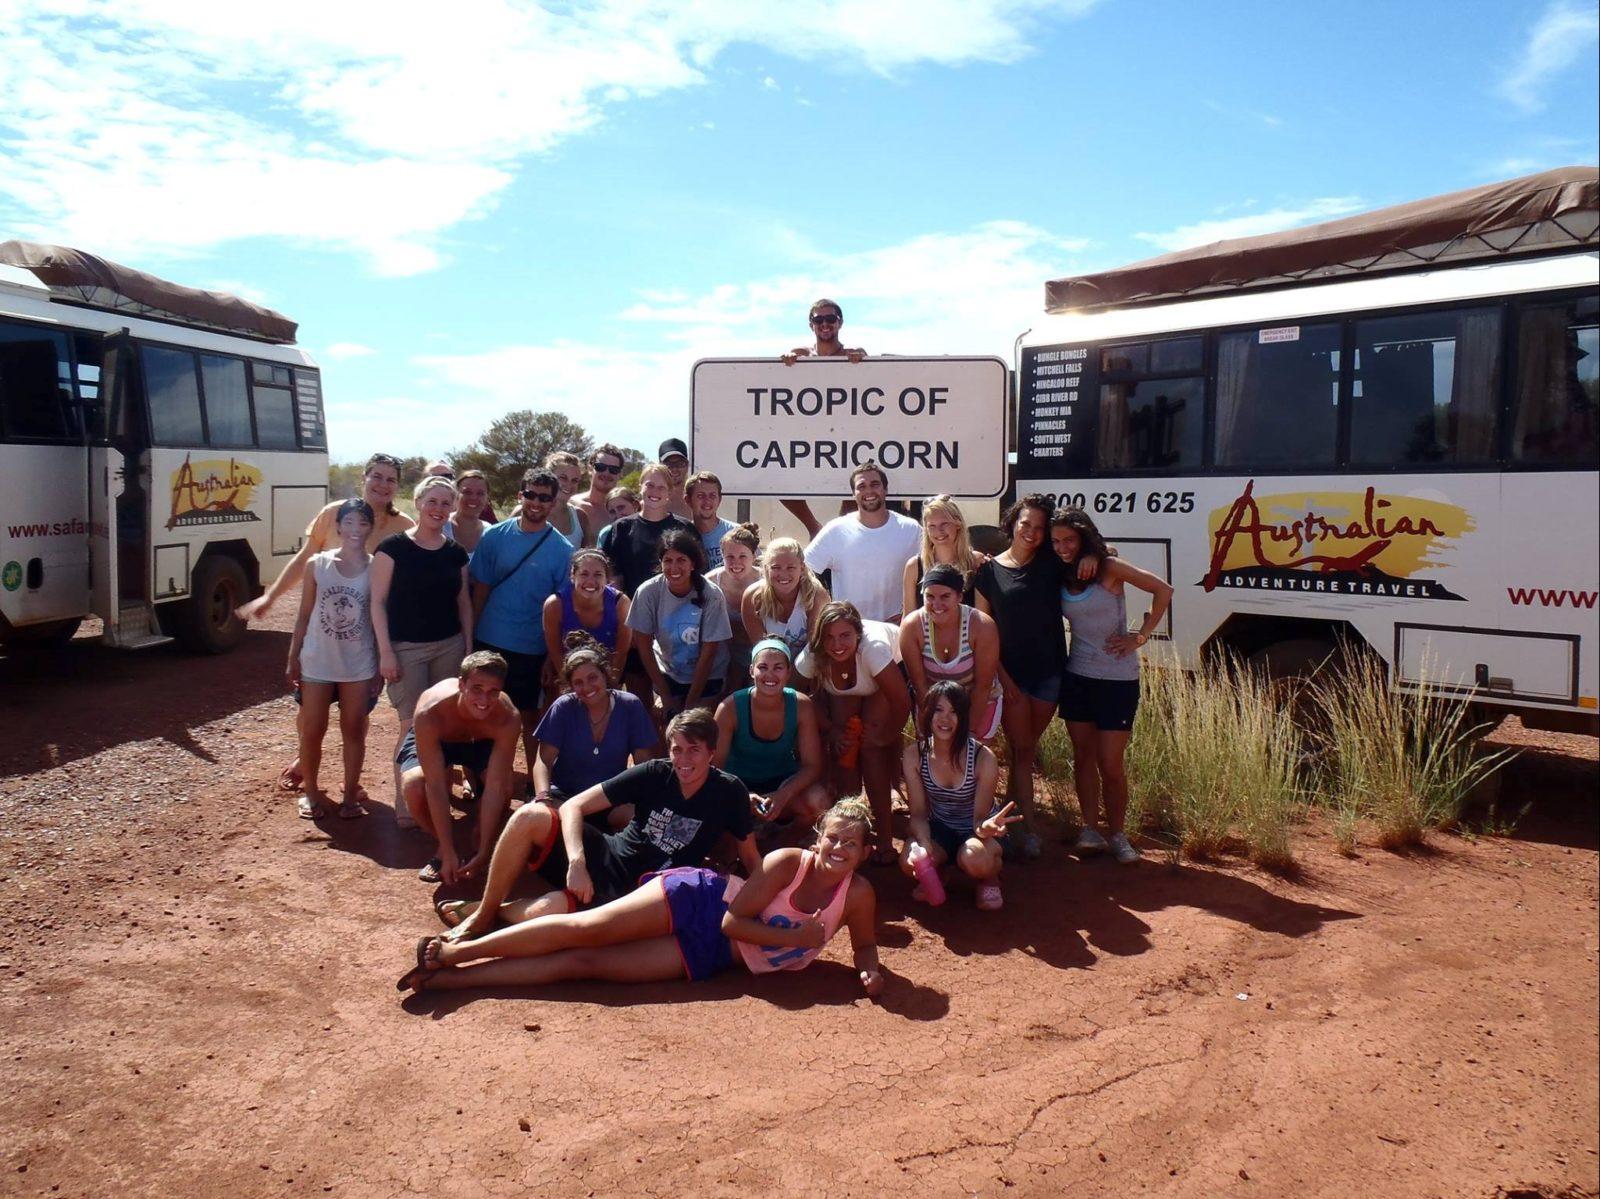 Australian Adventure Travel, Broome, Western Australia